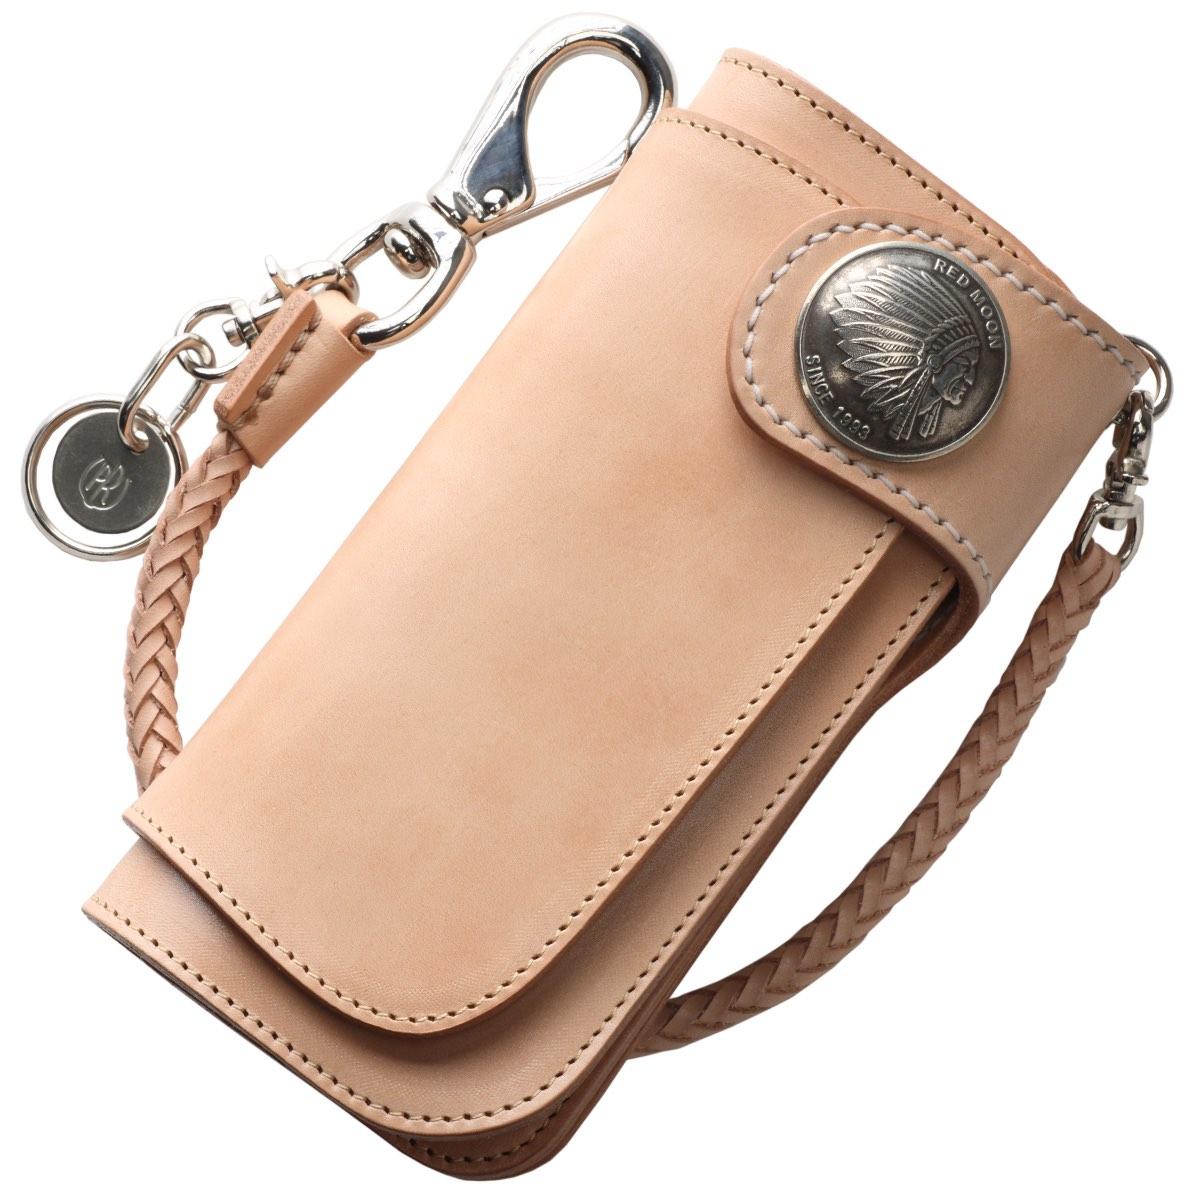 REDMOON Leather Wallet